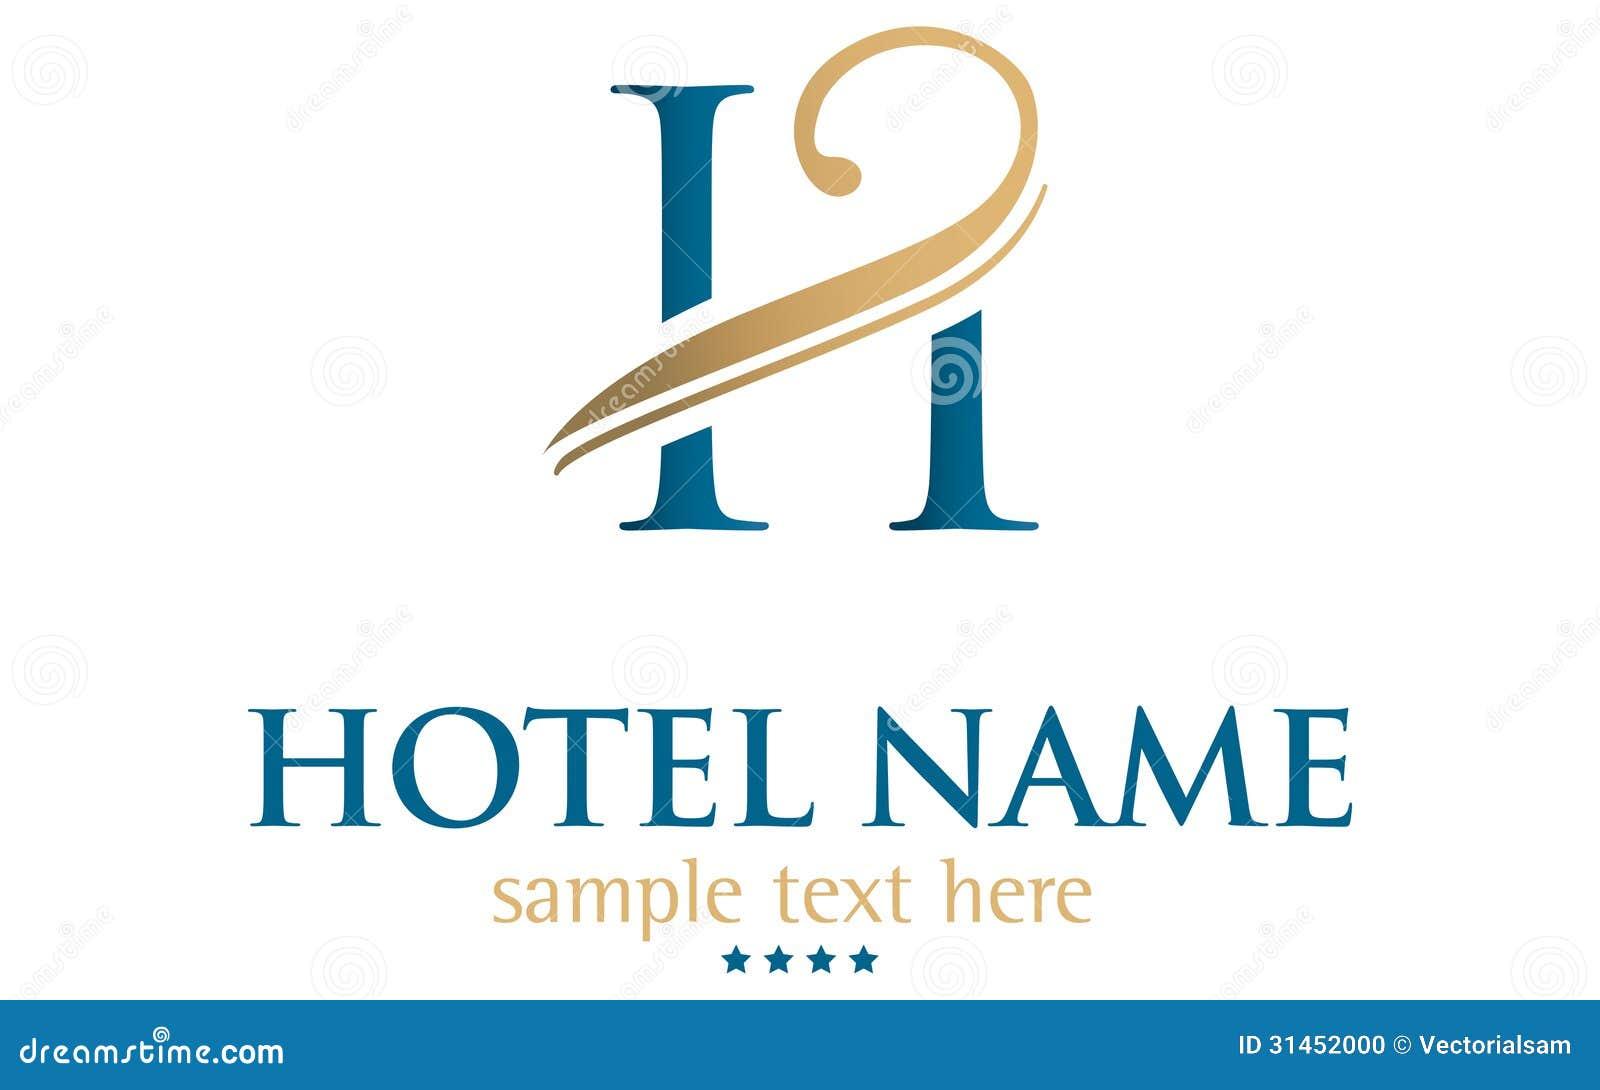 Hotel name stock photo image 31452000 for Design hotel logo